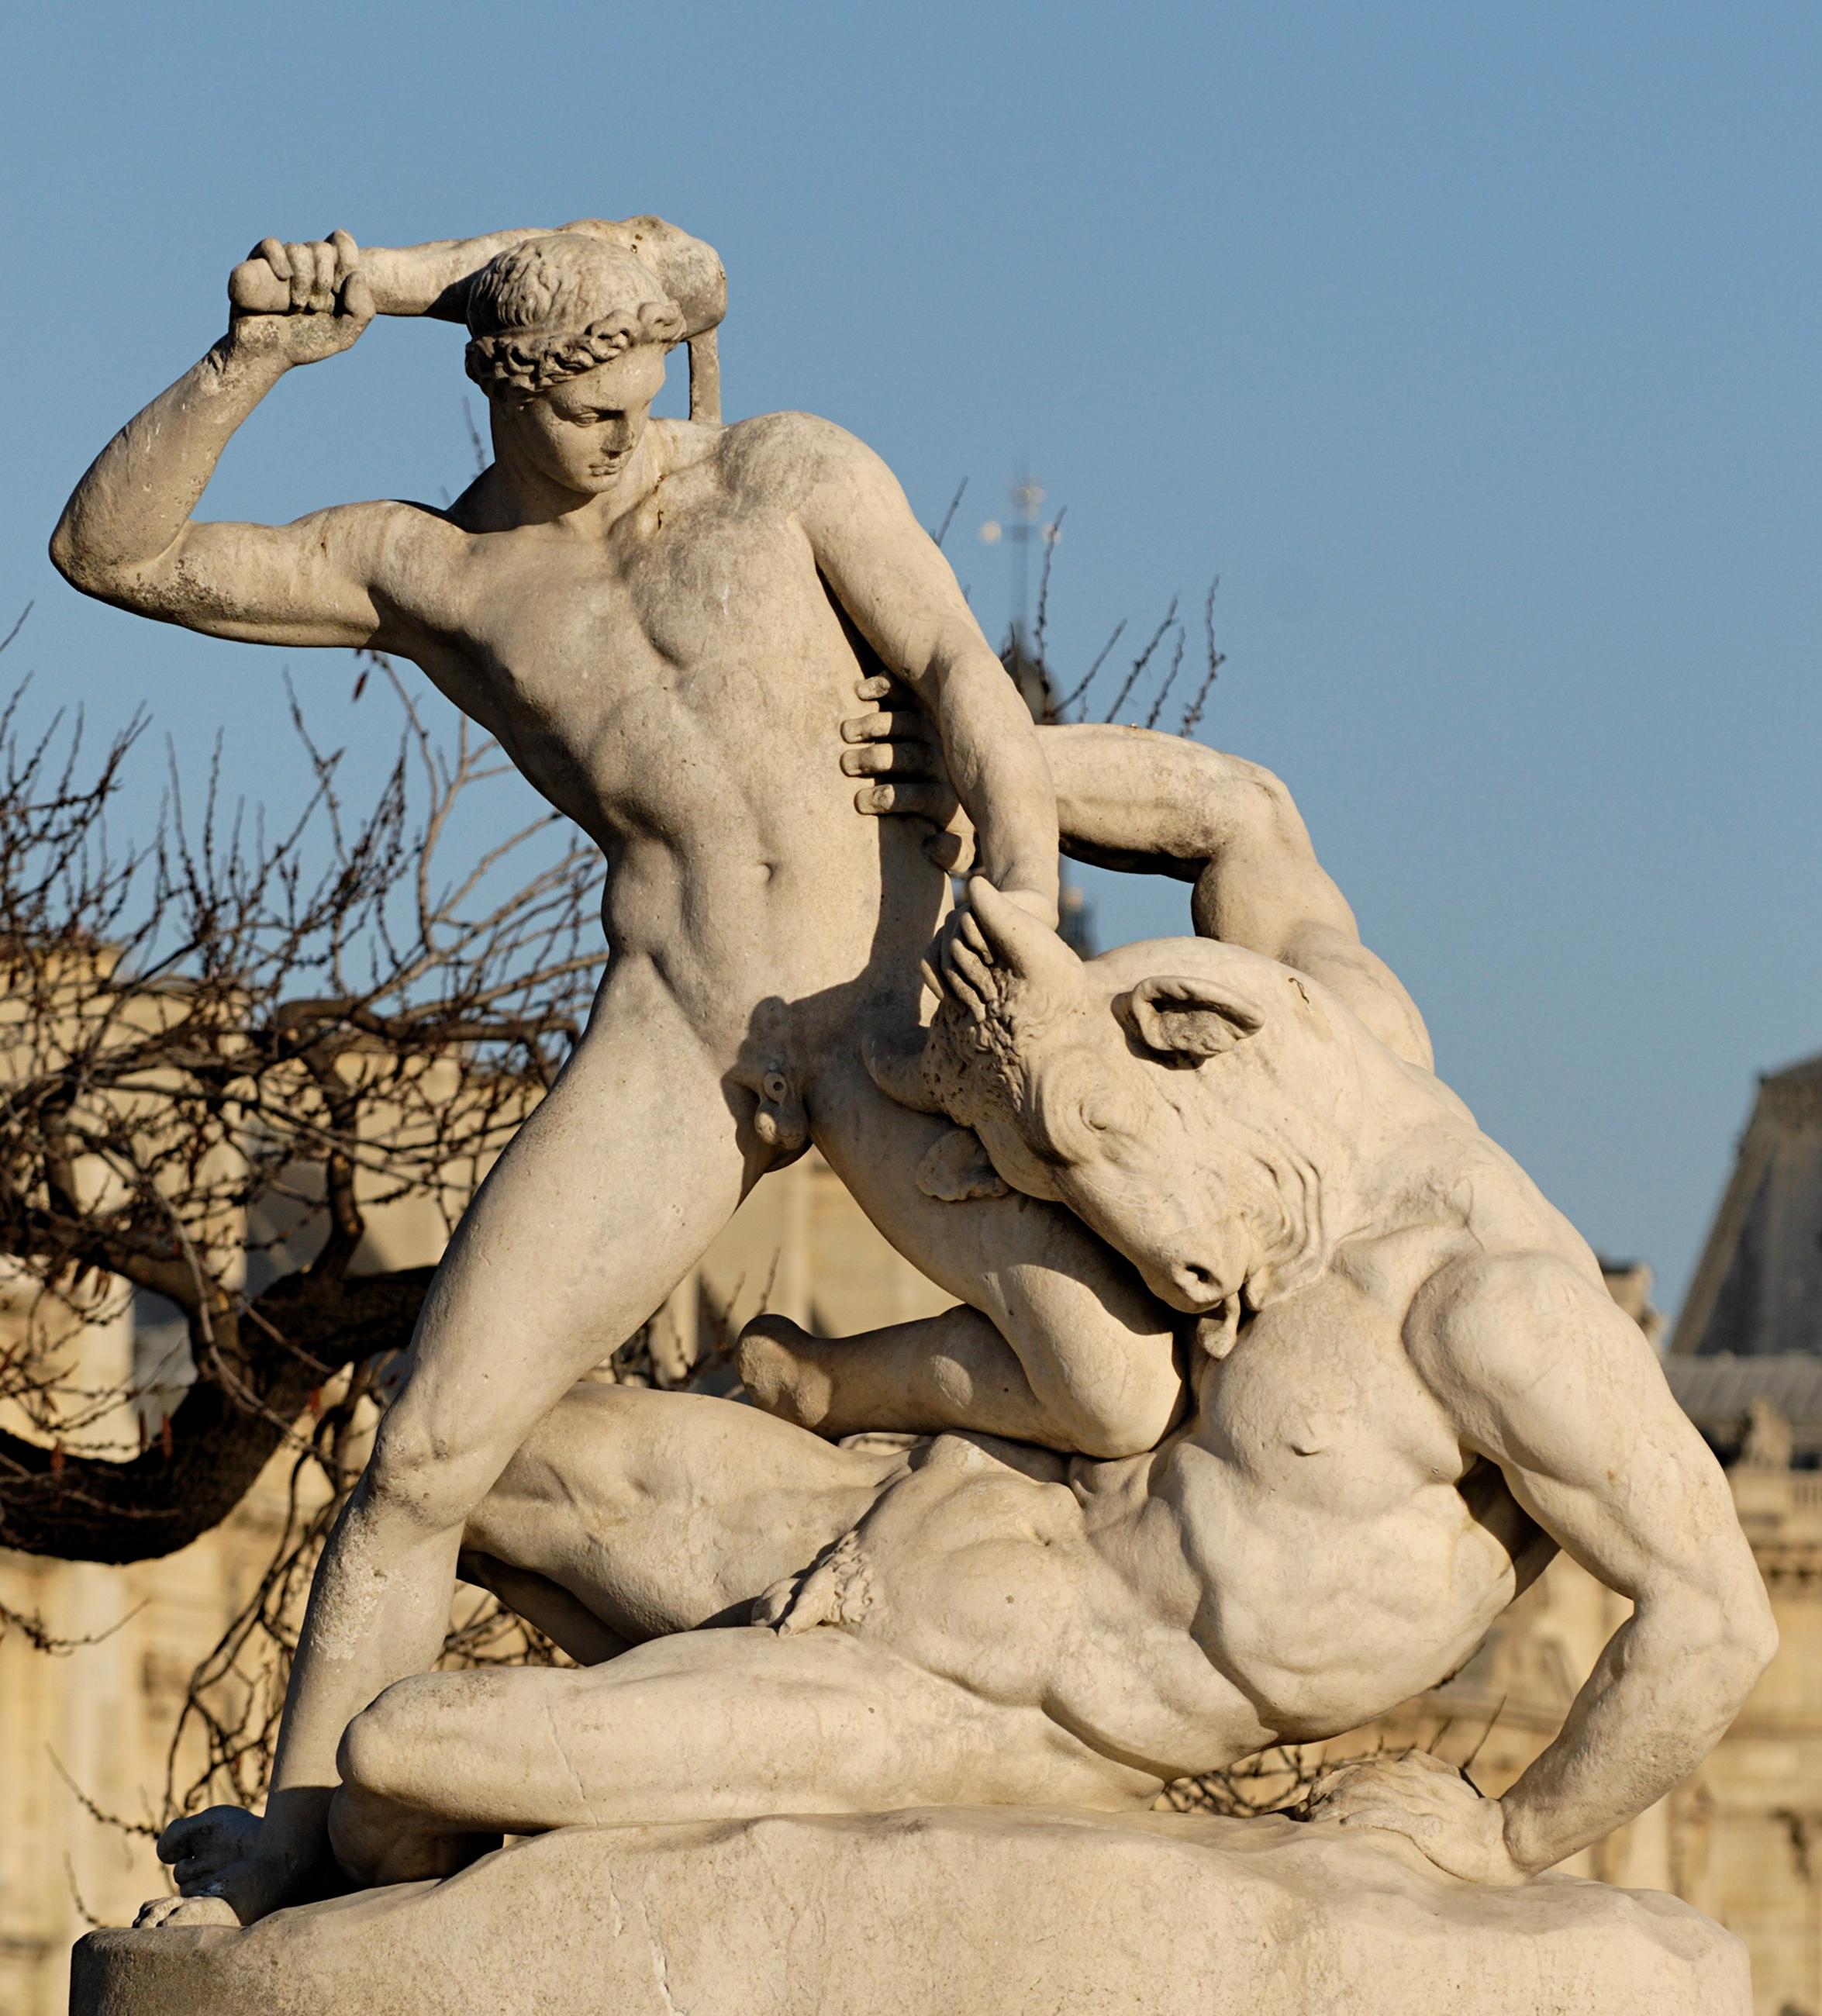 """Teseu e o Minotauro"", de Étienne-Jules Ramey (1796-1852).  Escultura de mármore nos Jardins des Tuileries (Paris), 1896."